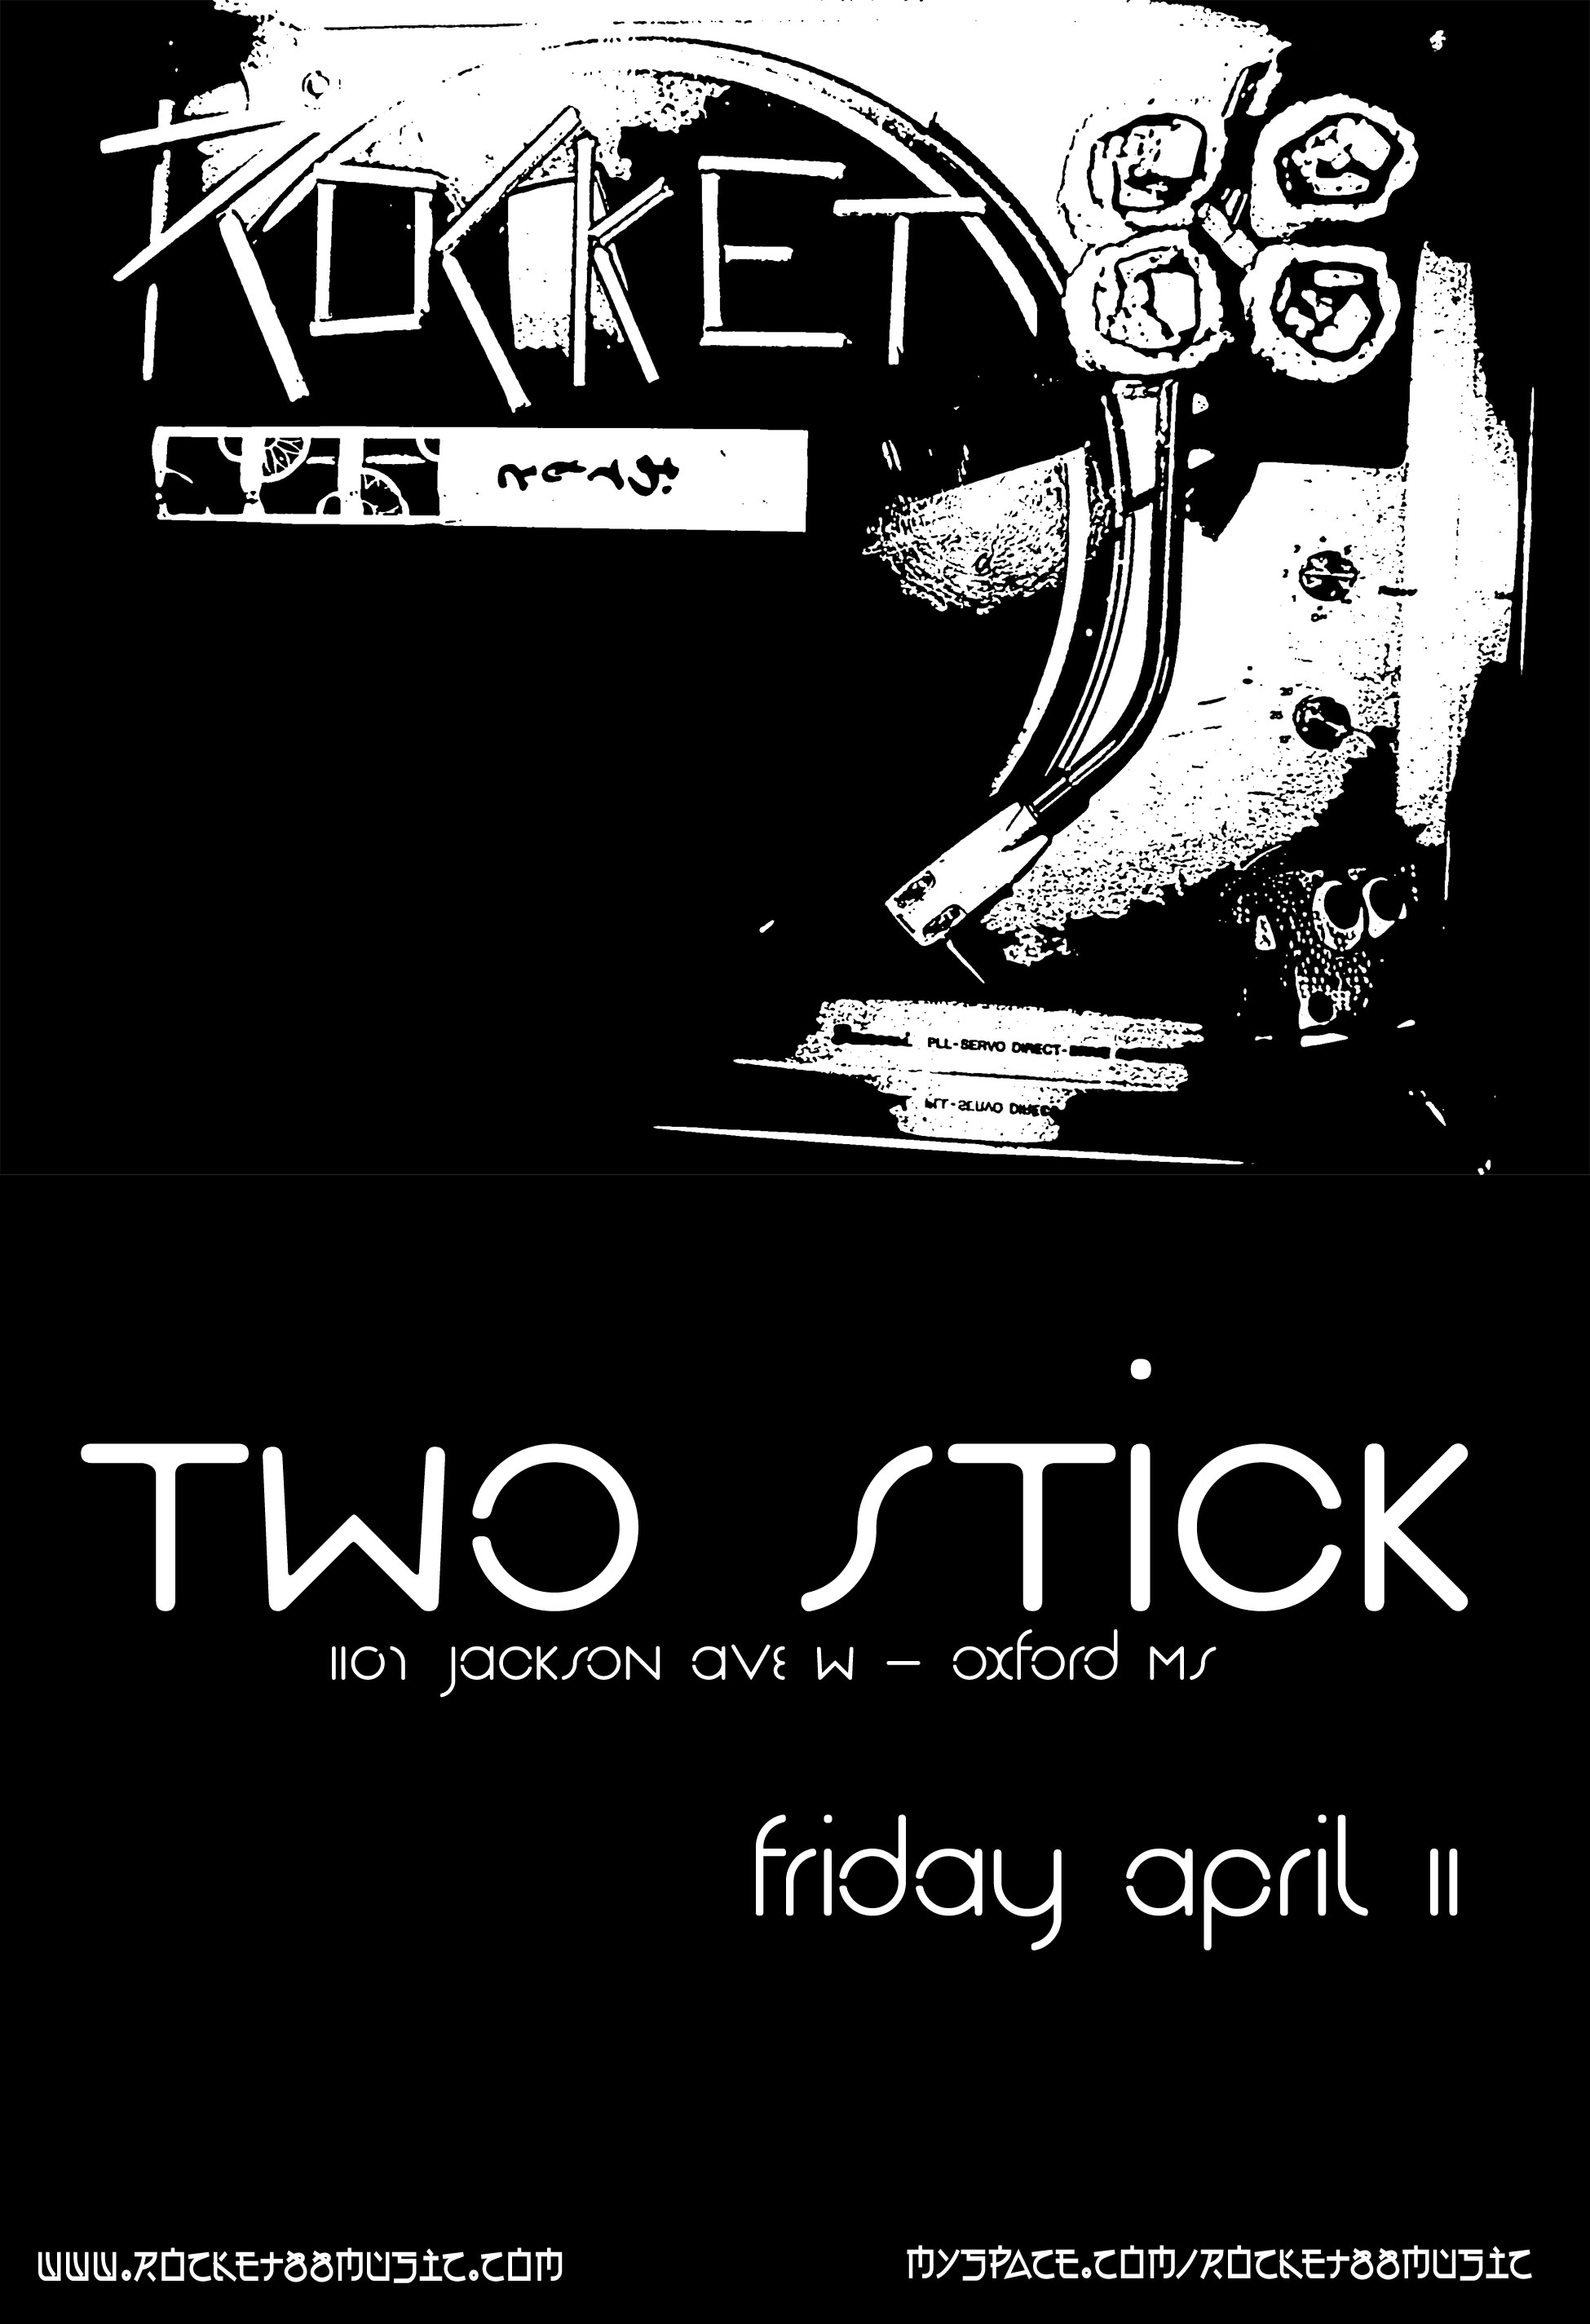 twostick-041108